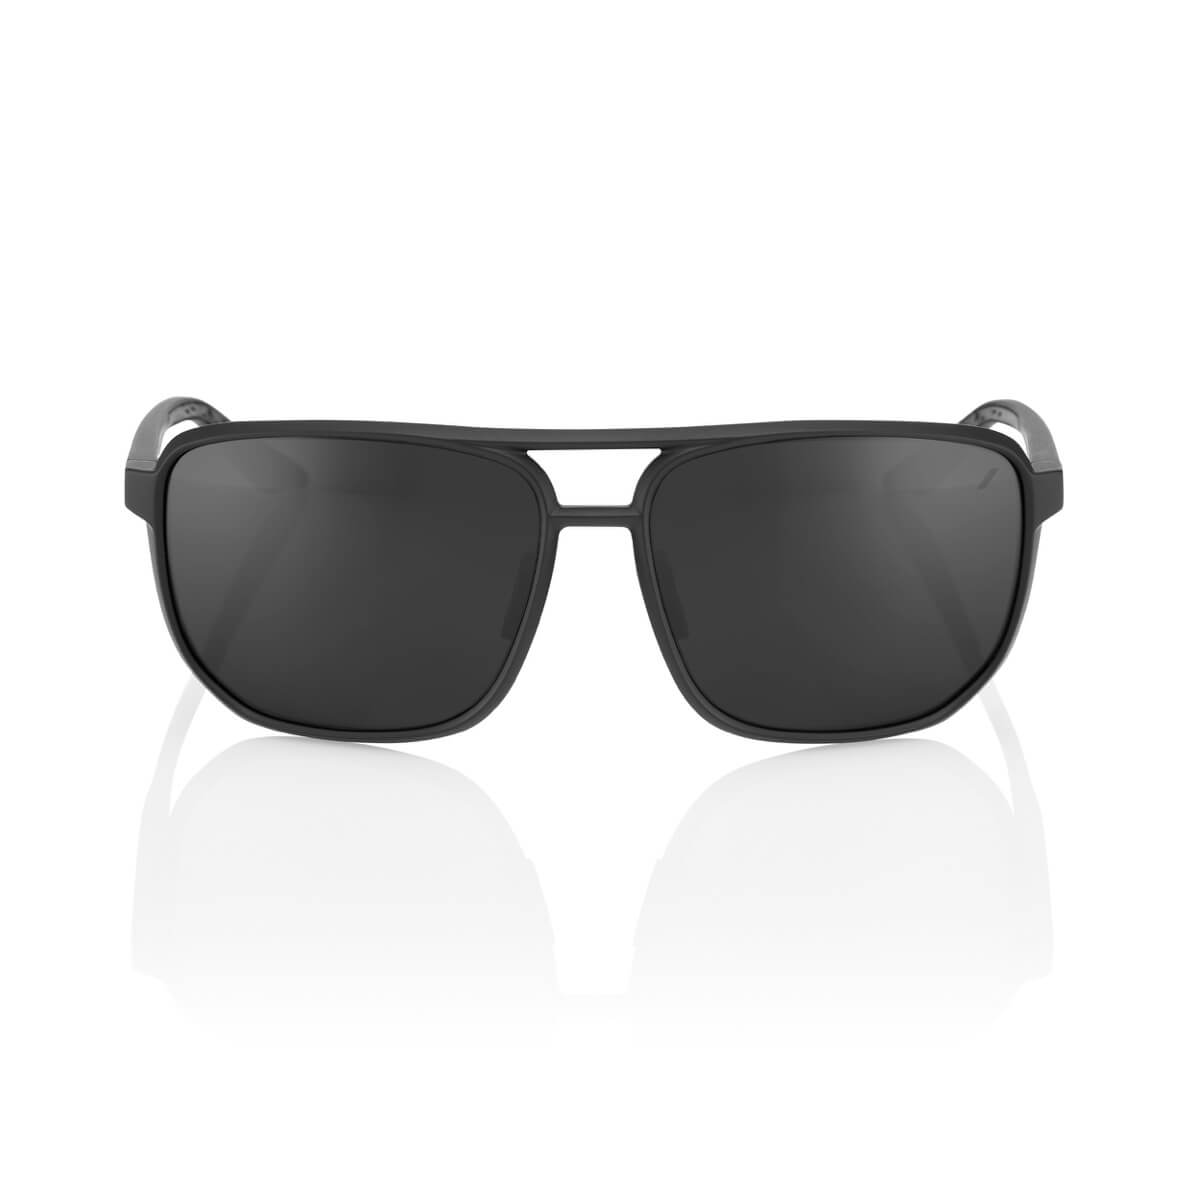 KONNOR Aviator Square – Matte Black – Black Mirror Lens